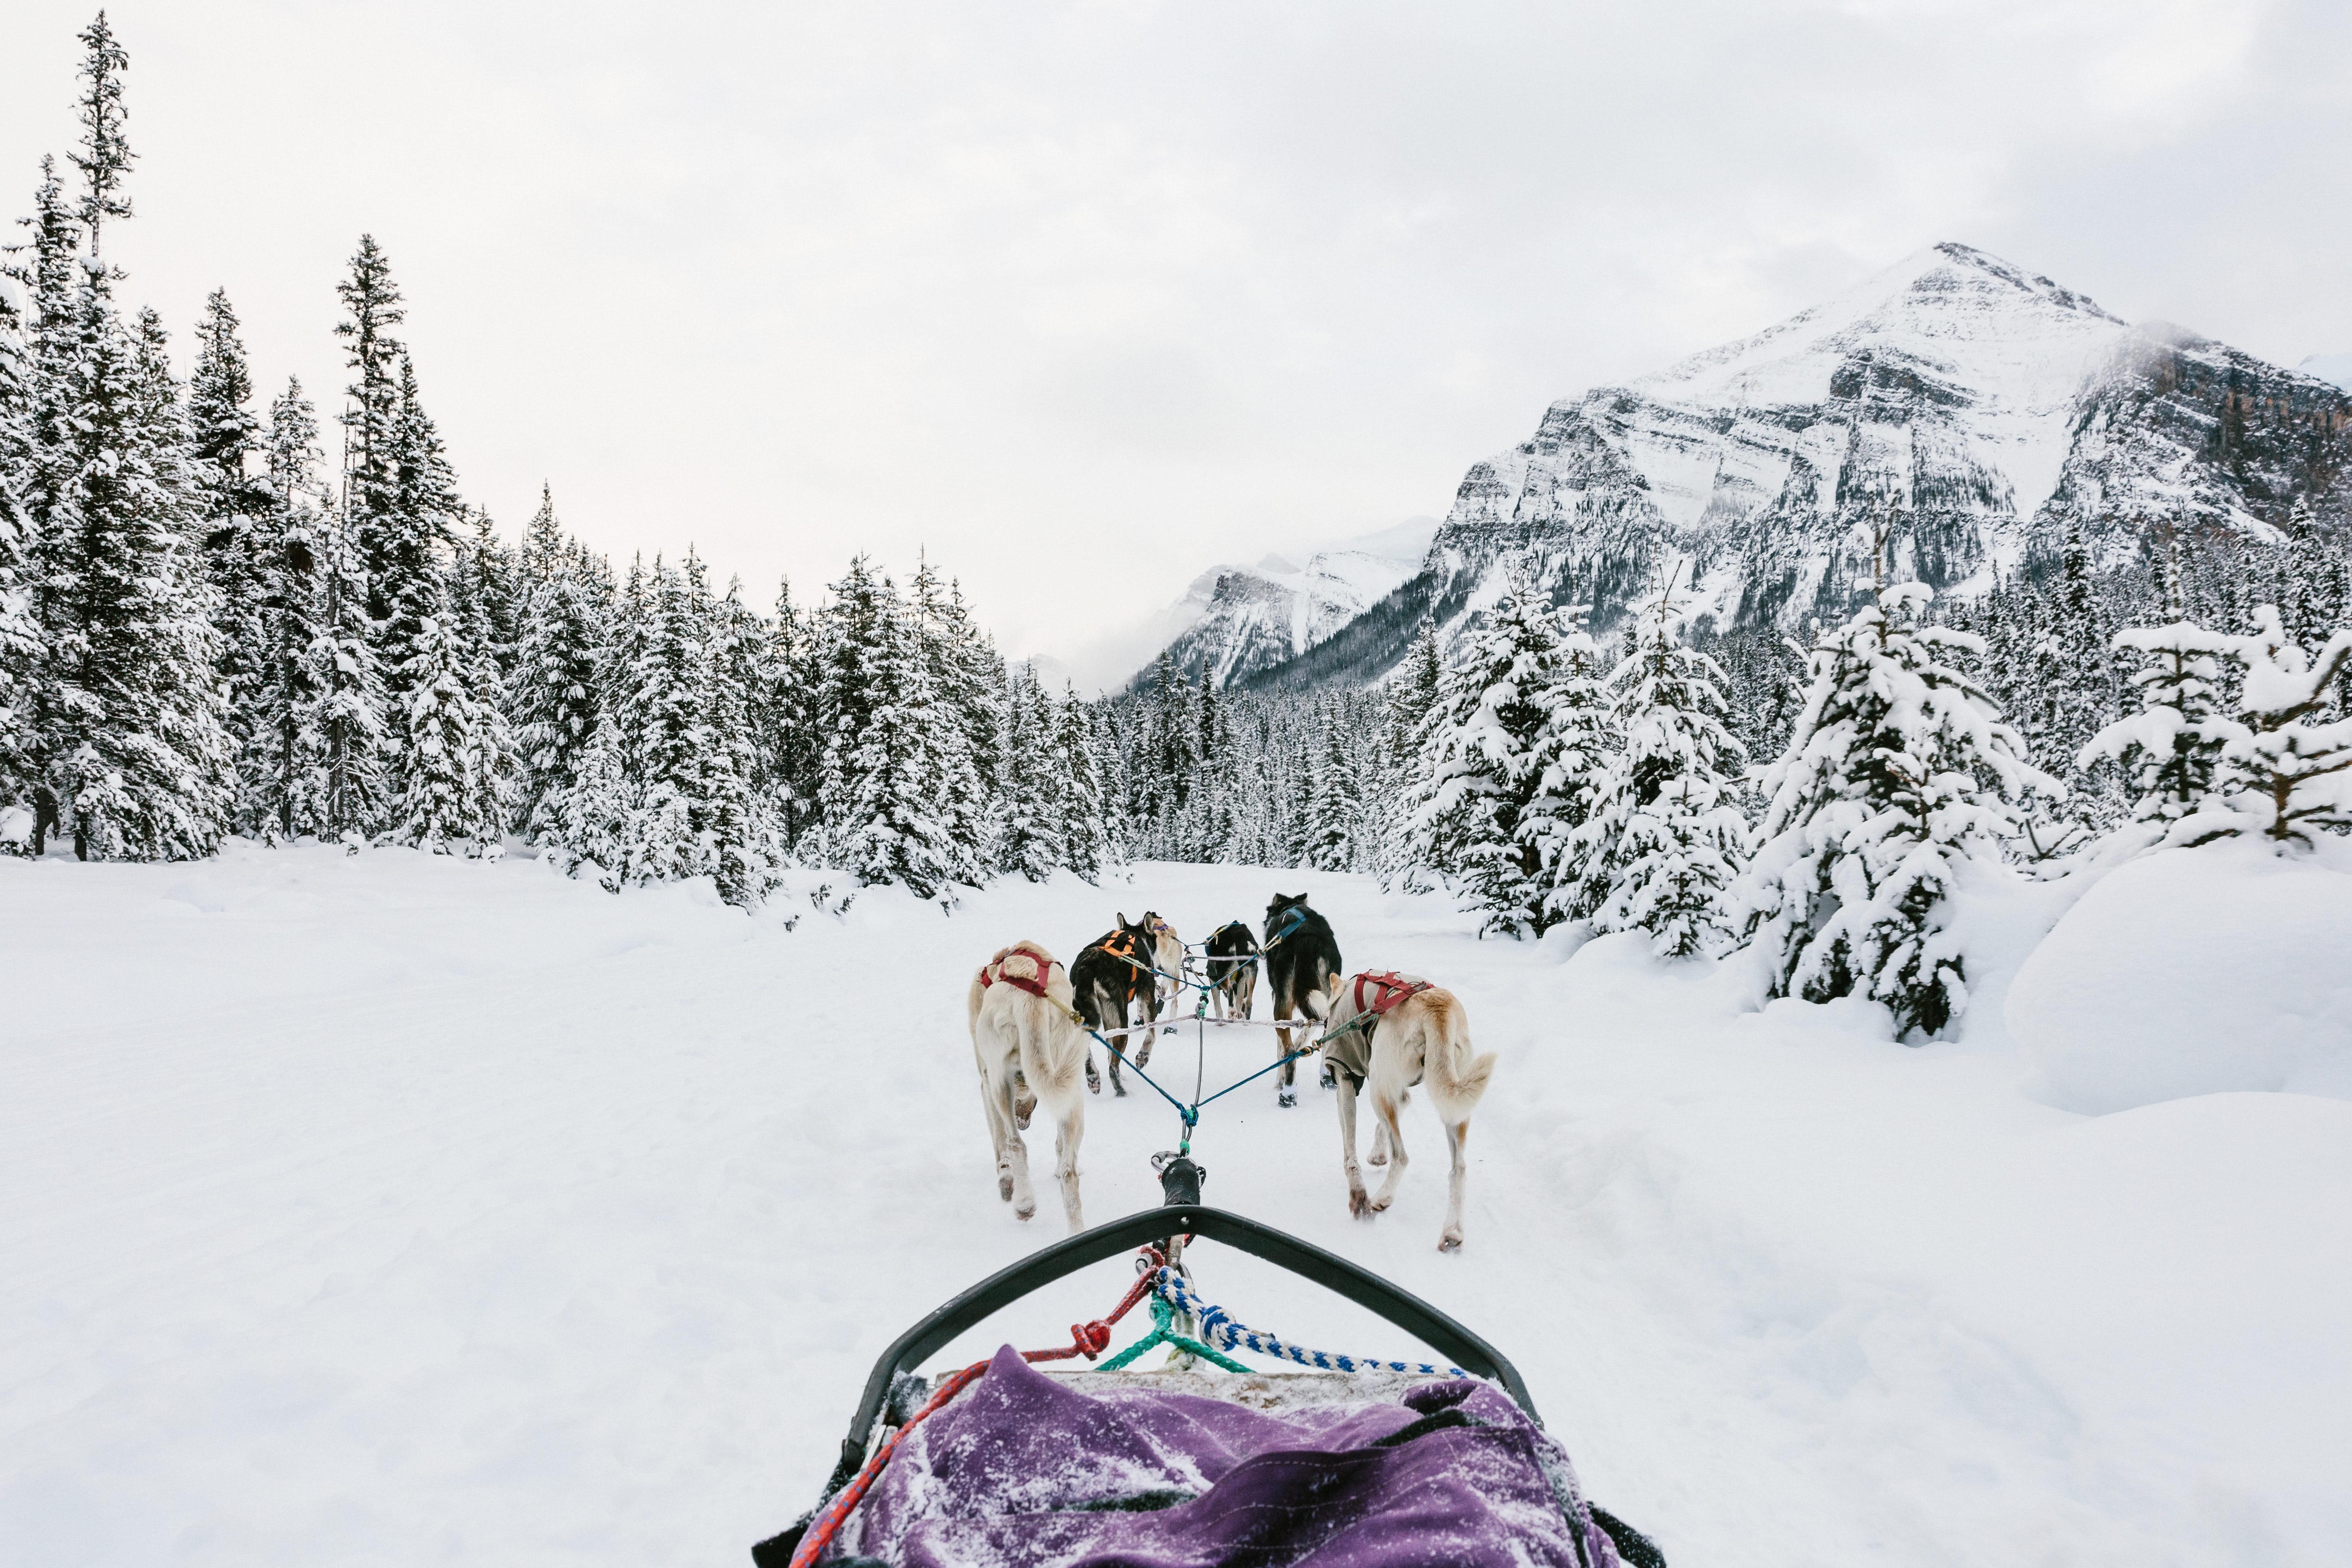 9 Best Winter Adventures in Banff Canadia - Dog Sledding - Renee Roaming